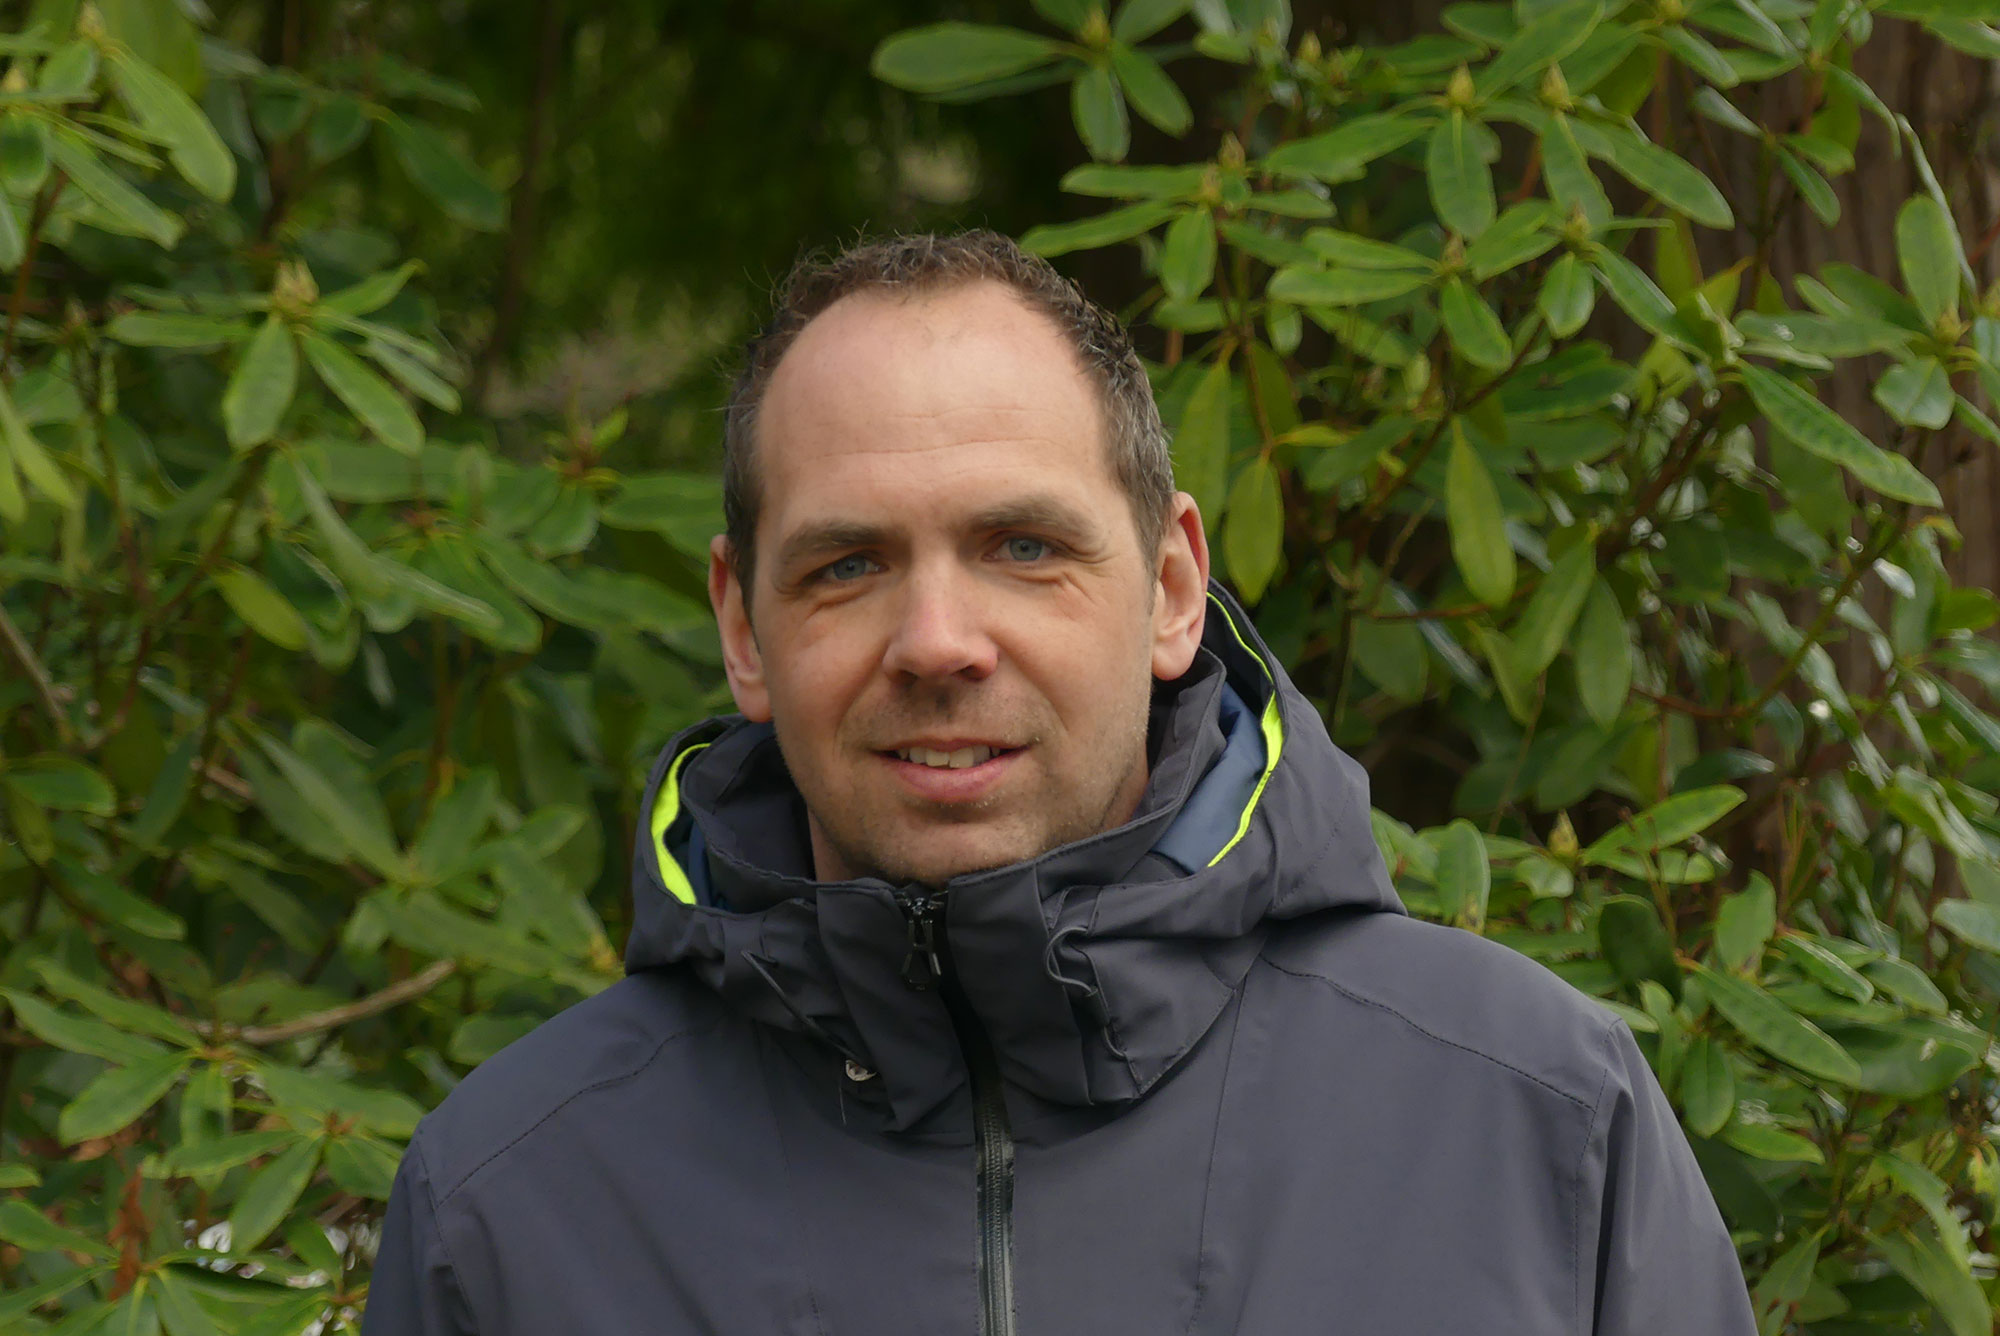 Sander Pruim